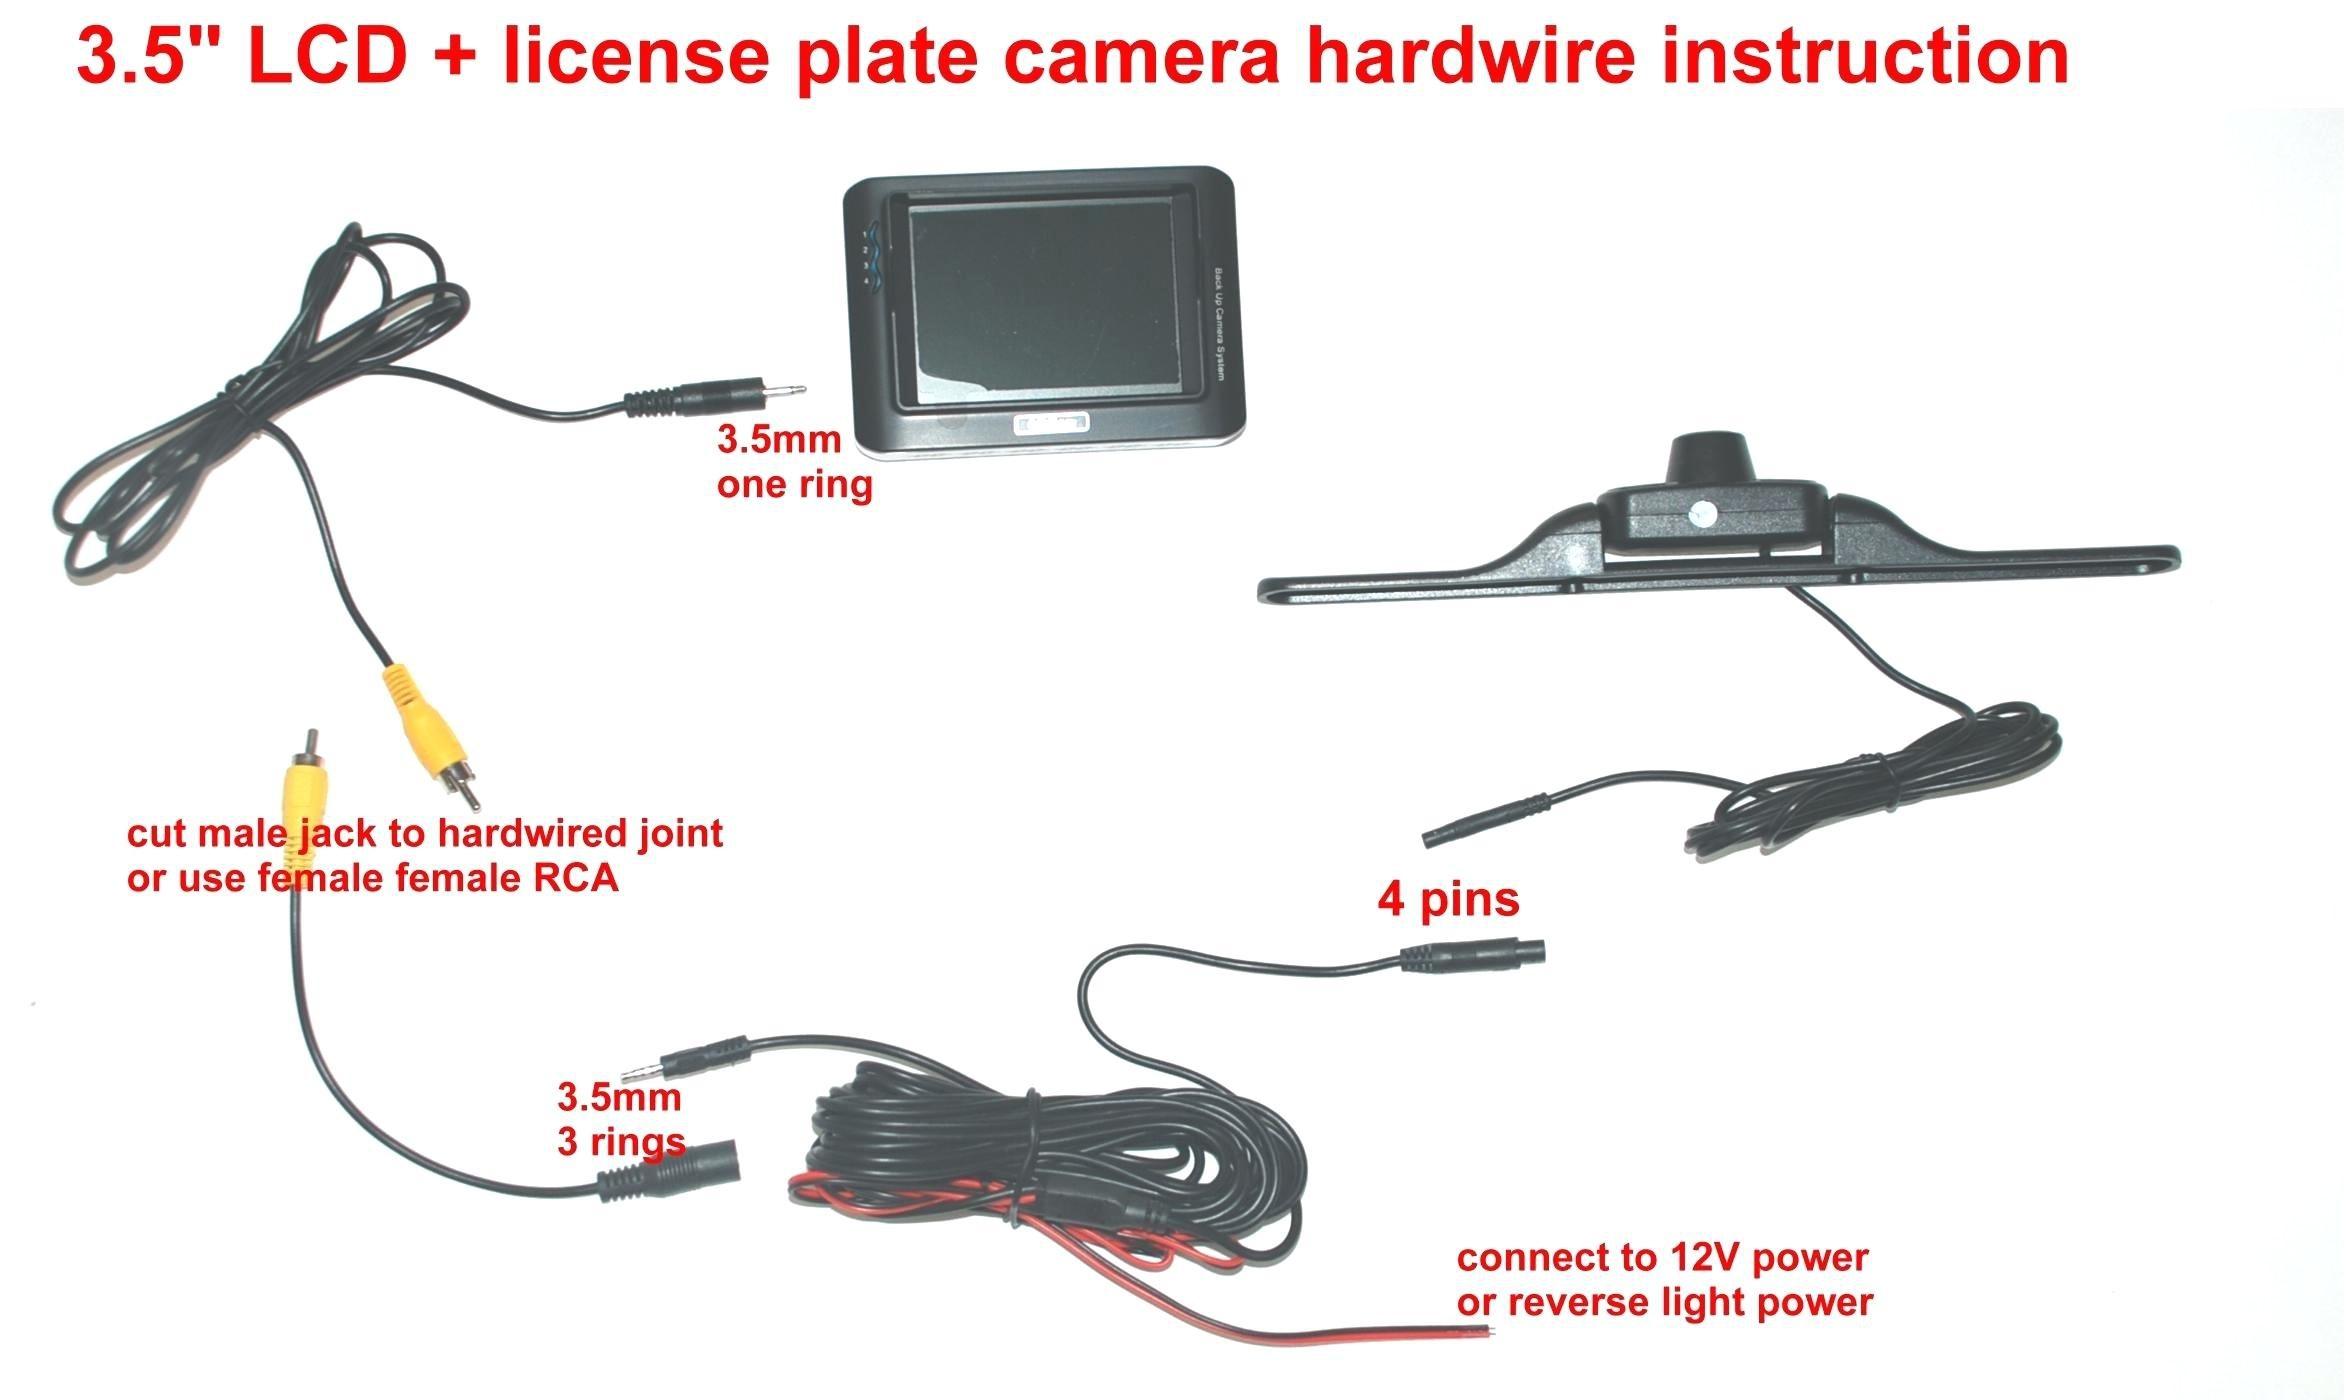 Tundra Backup Camera Wiring Diagram - Wiring Diagram Update on